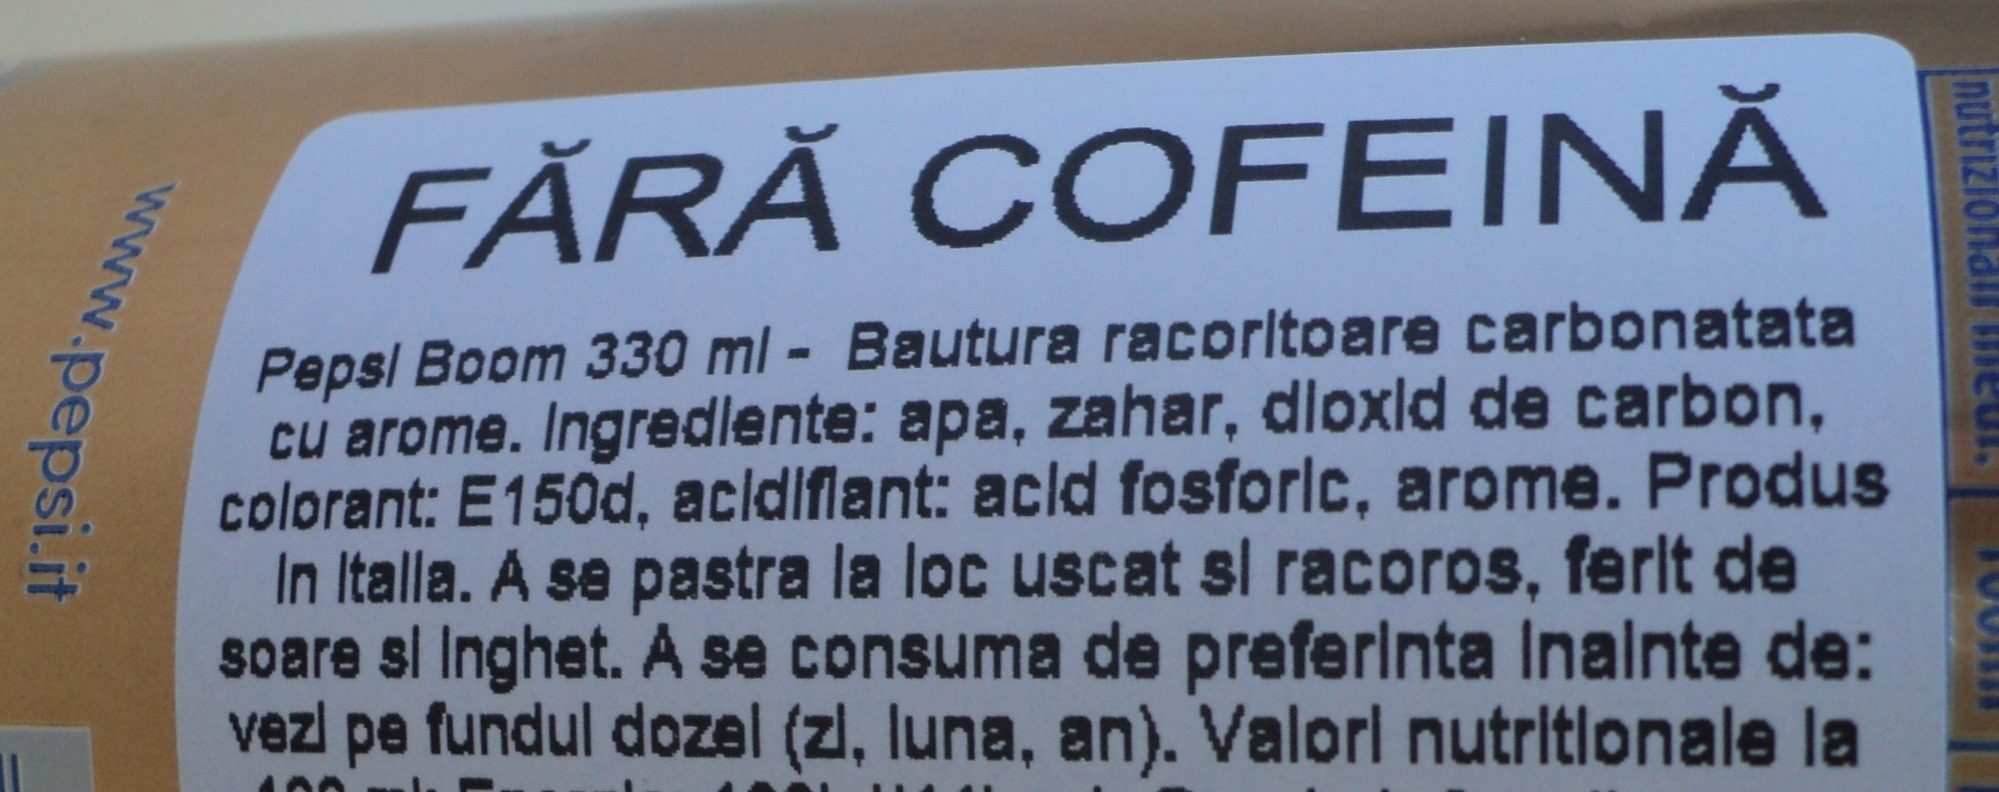 Pepsi S / Cafeina LL.375 - Ingredients